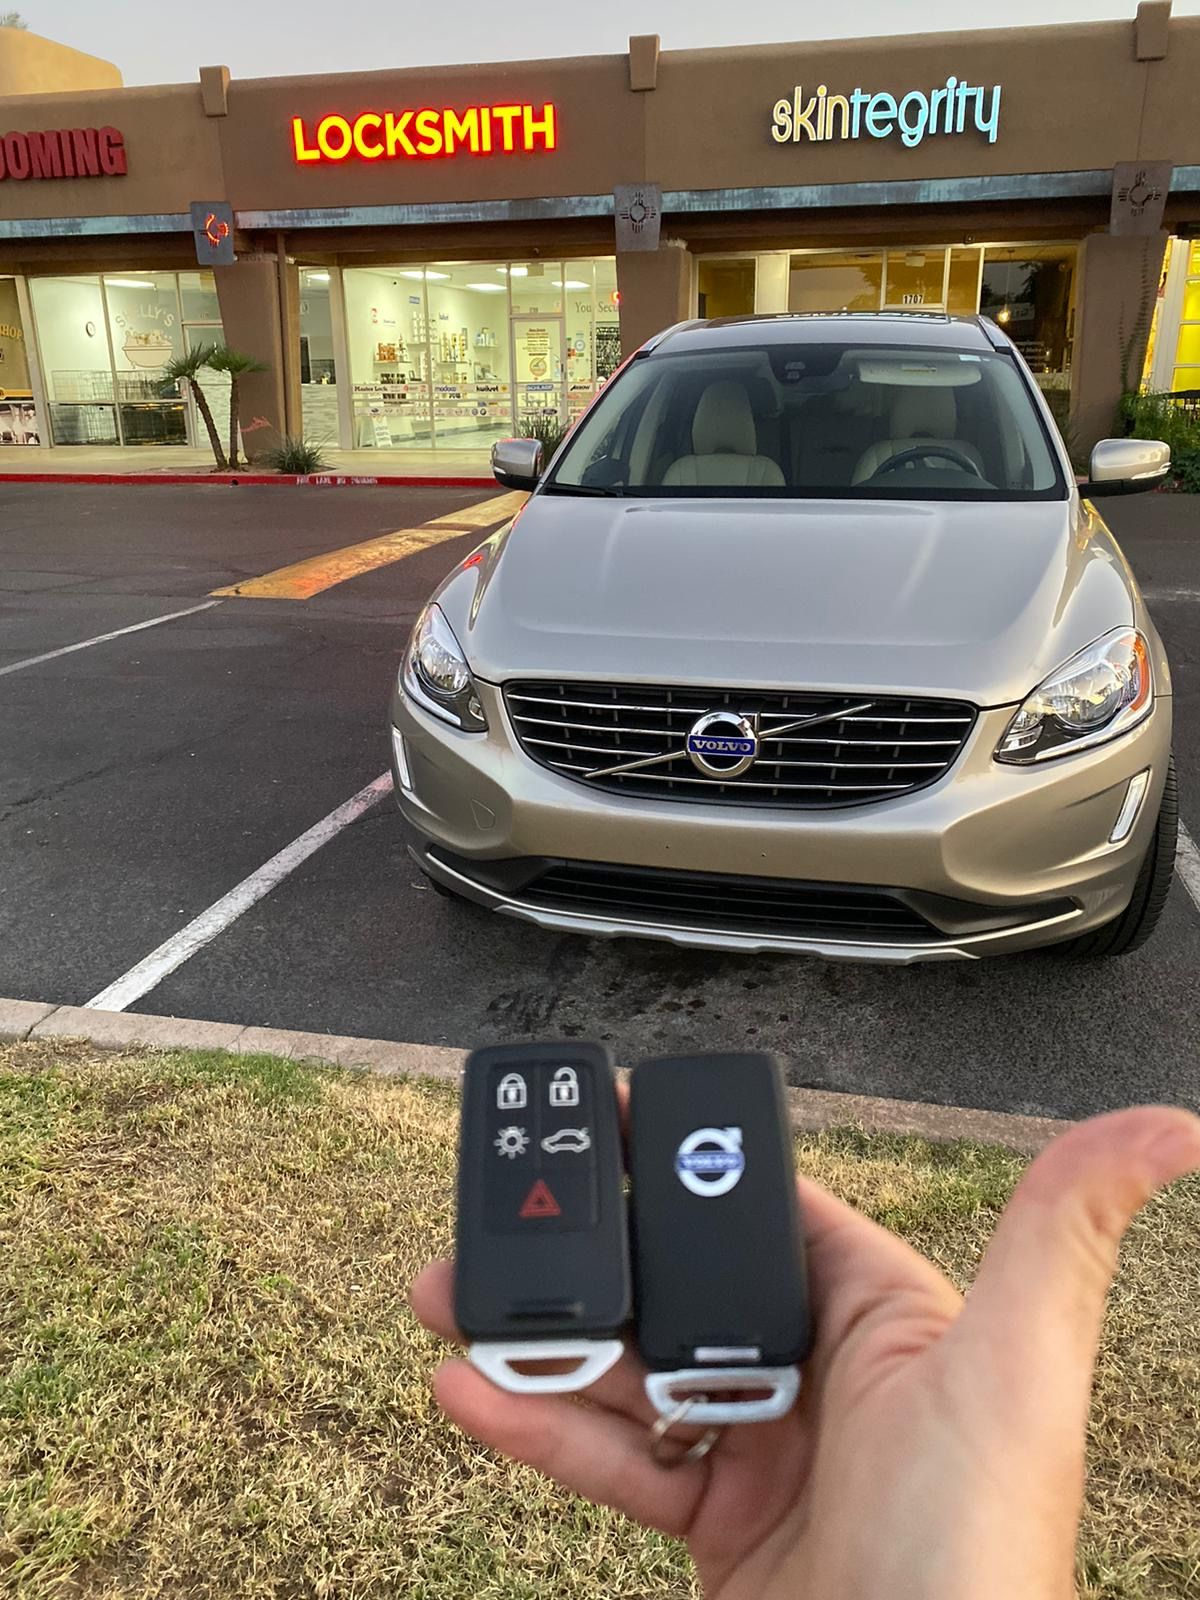 2016 Volvo Xc60 5 Button Smart Key Spare Smart Key Duplication Locksmith Smart Key Car Key Replacement